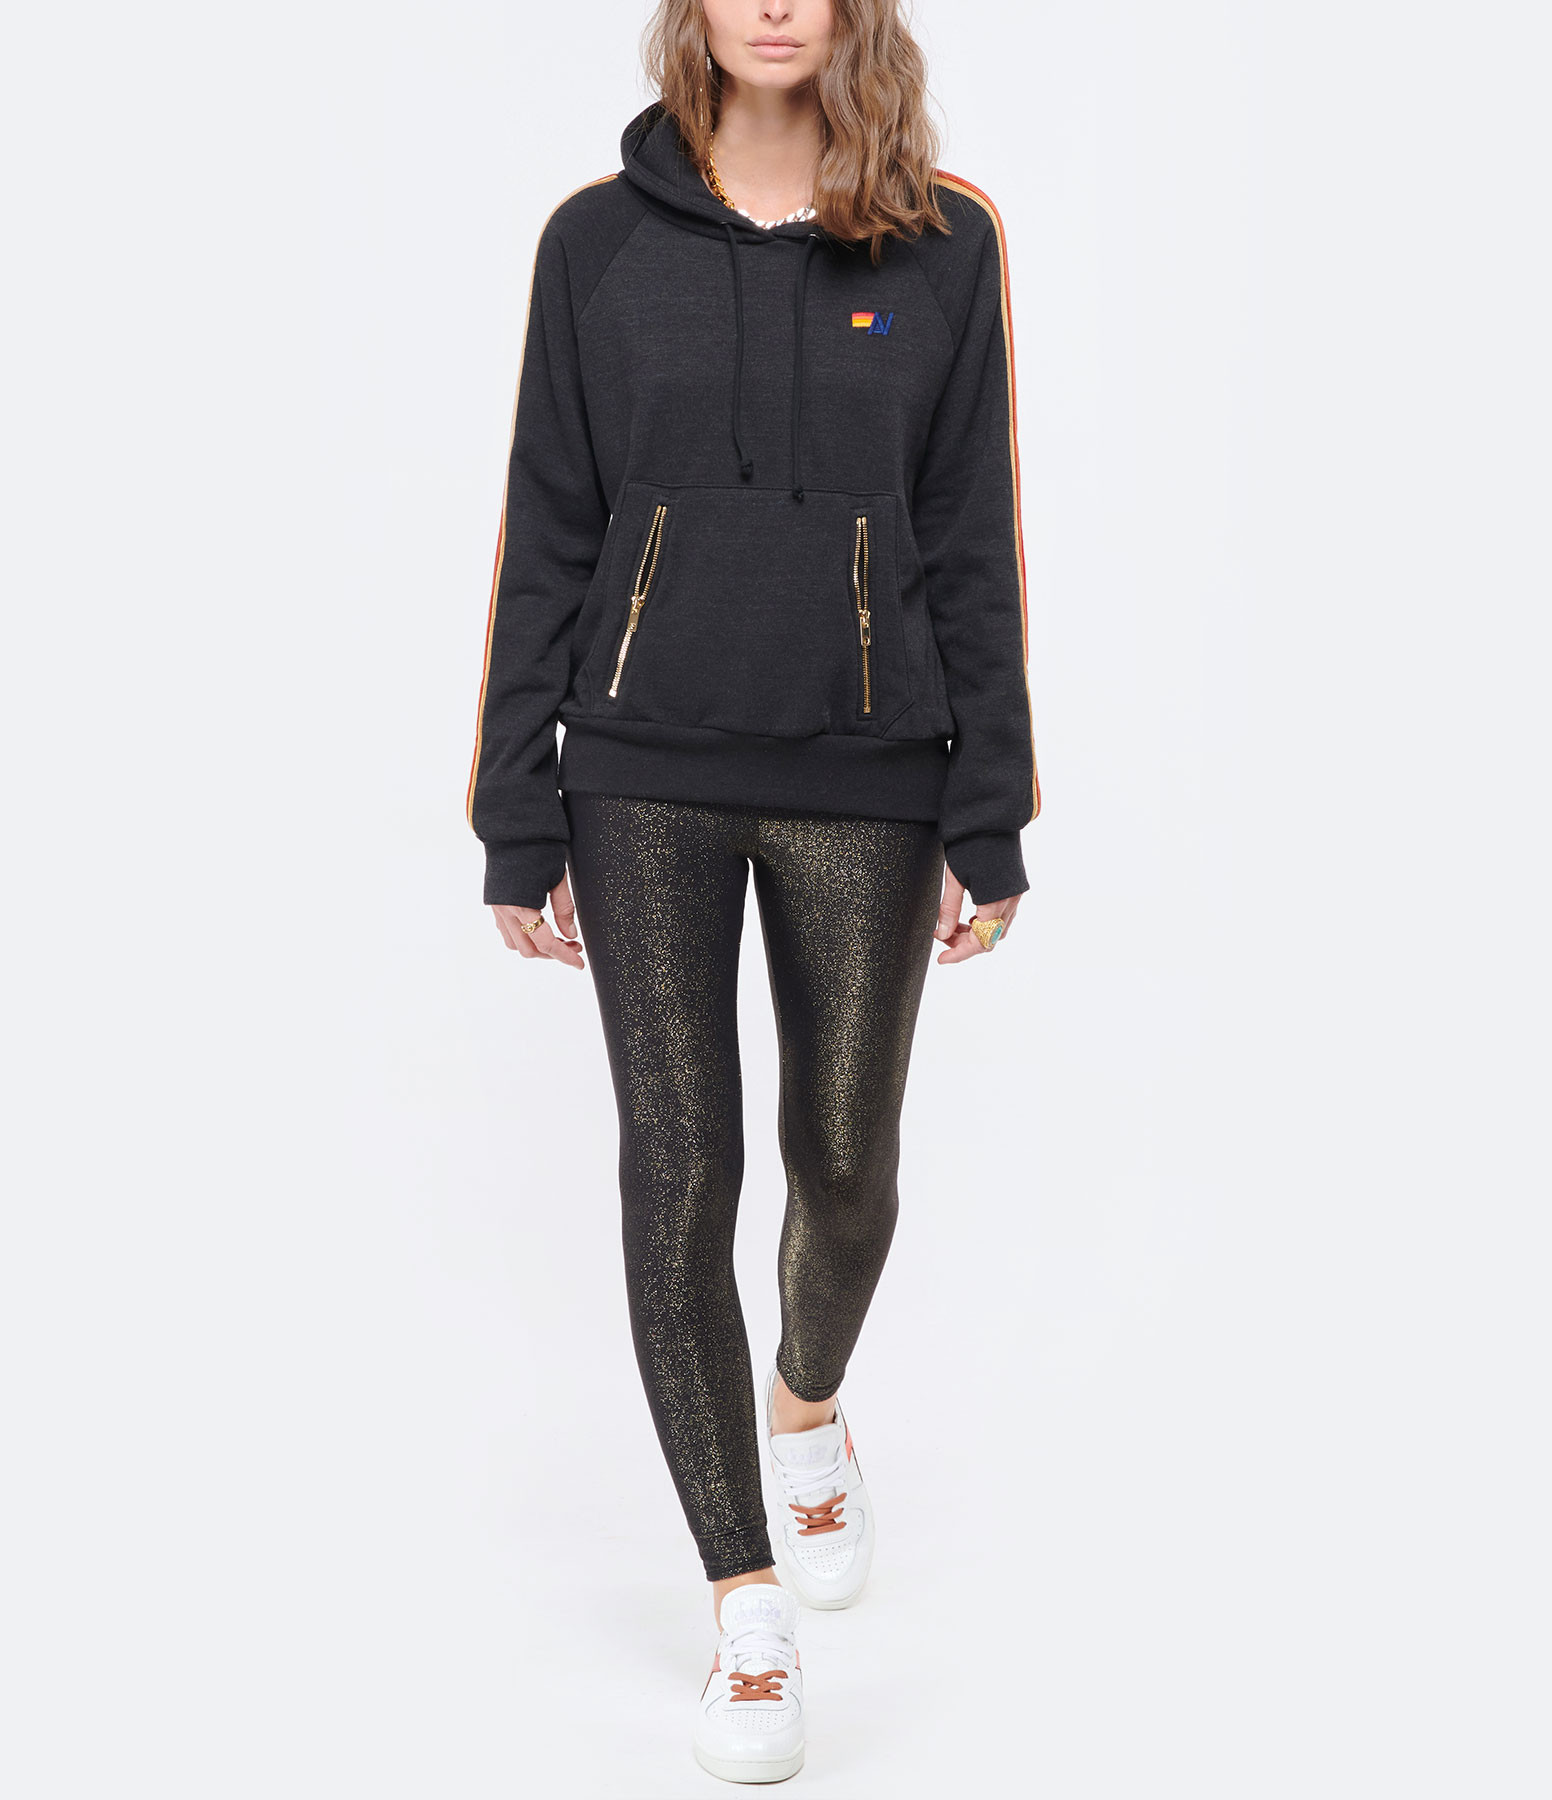 AVIATOR NATION - Sweatshirt Hoodie Classic Rayures Noir